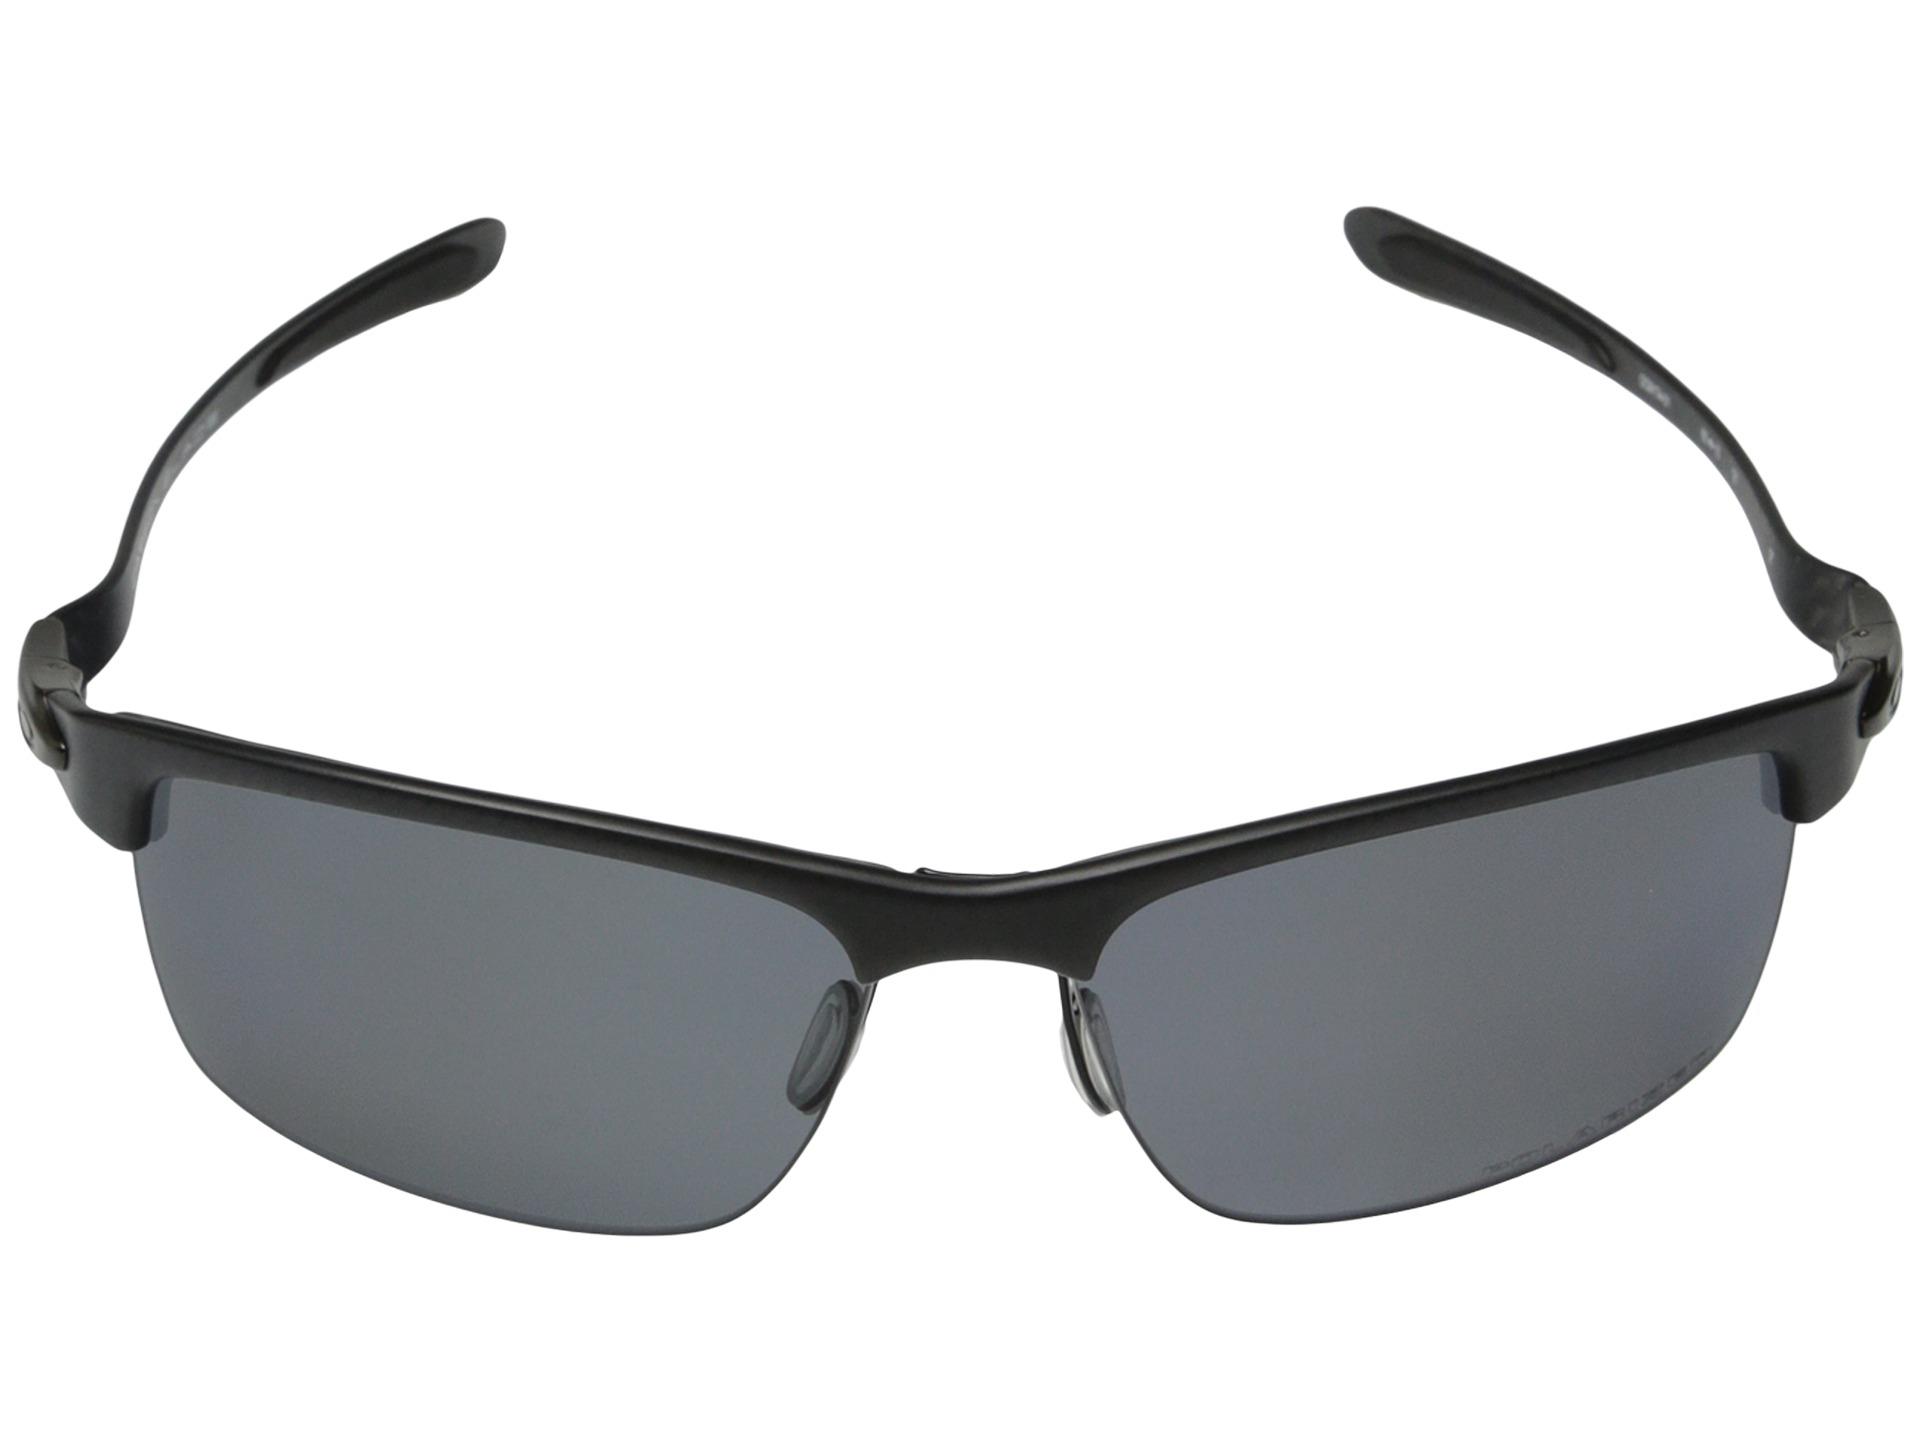 Lyst - Oakley Carbon Blade in Gray for Men